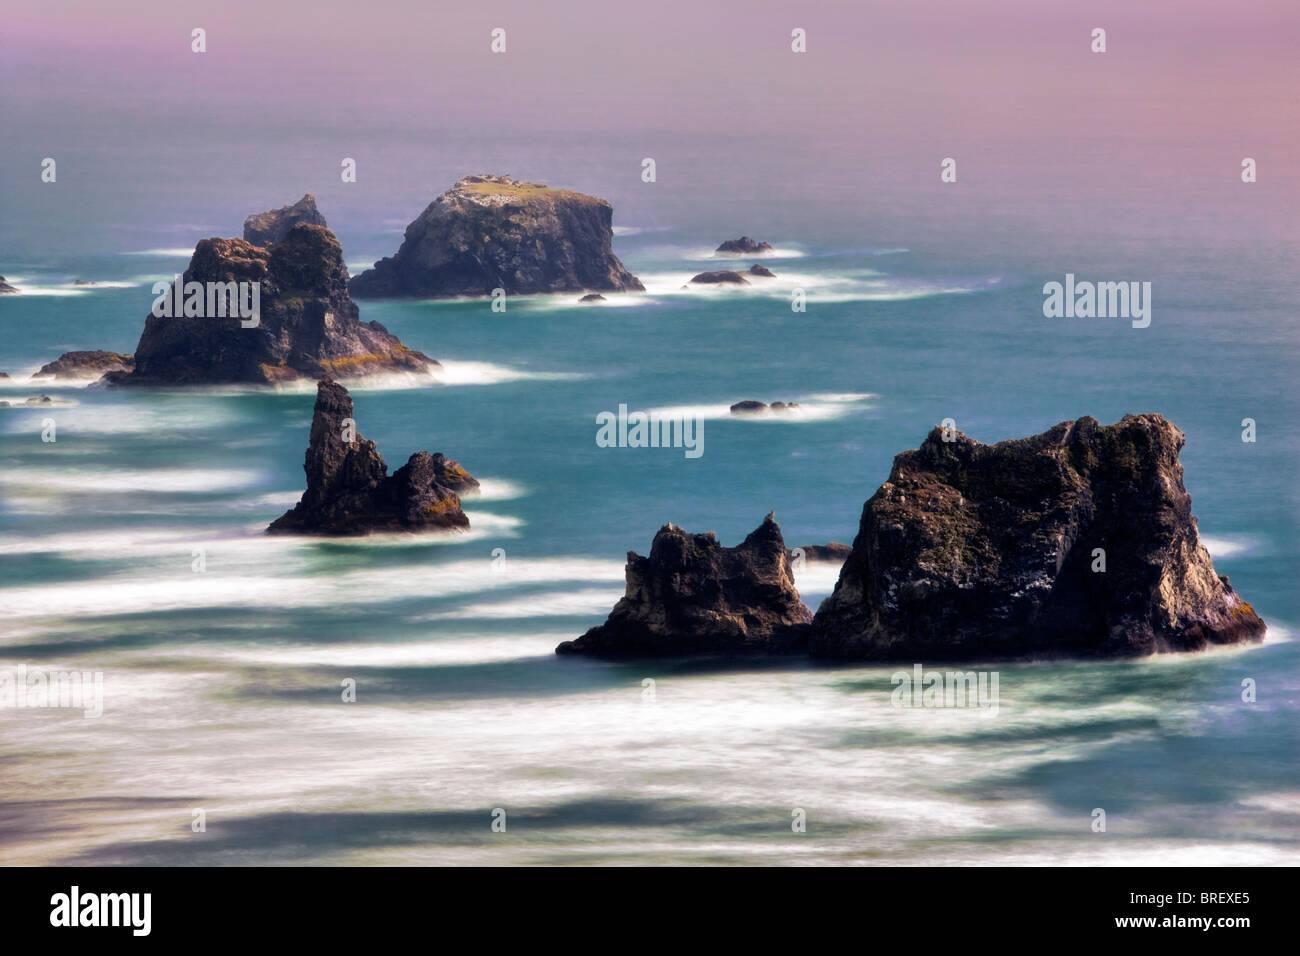 Sea stacks off Samuel H. Boardman State Scenic Corridor. Oregon - Stock Image